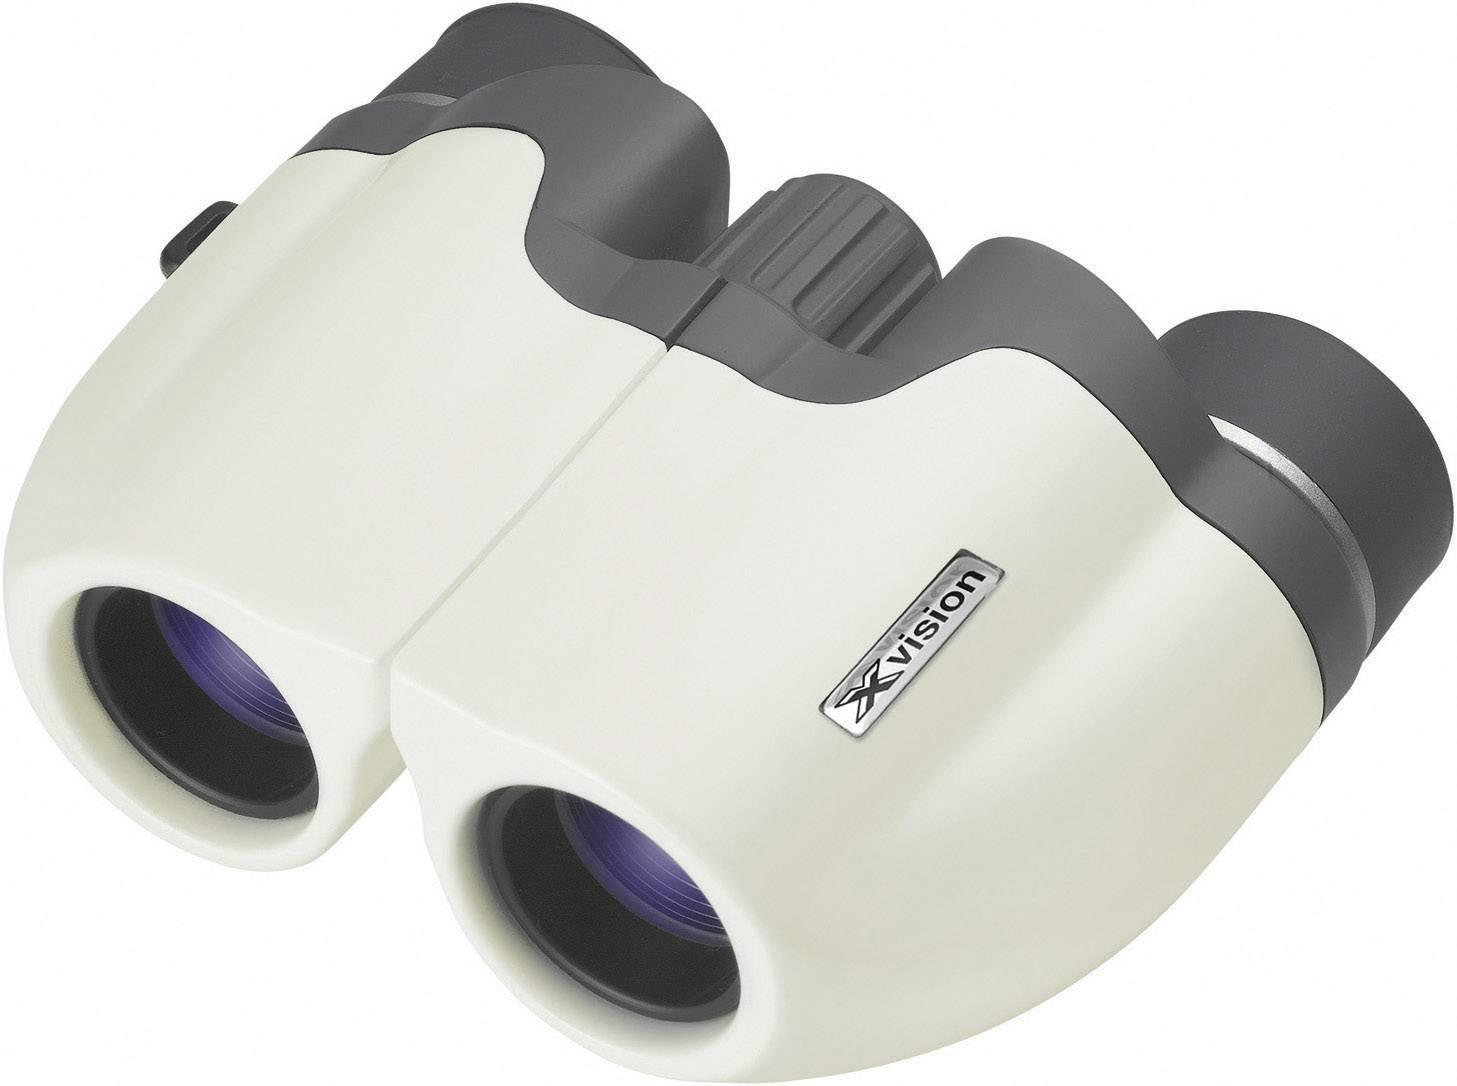 Ďalekohľad Eschenbach X-Vision 8x21 841568212 21 mm, biela (lesklá)